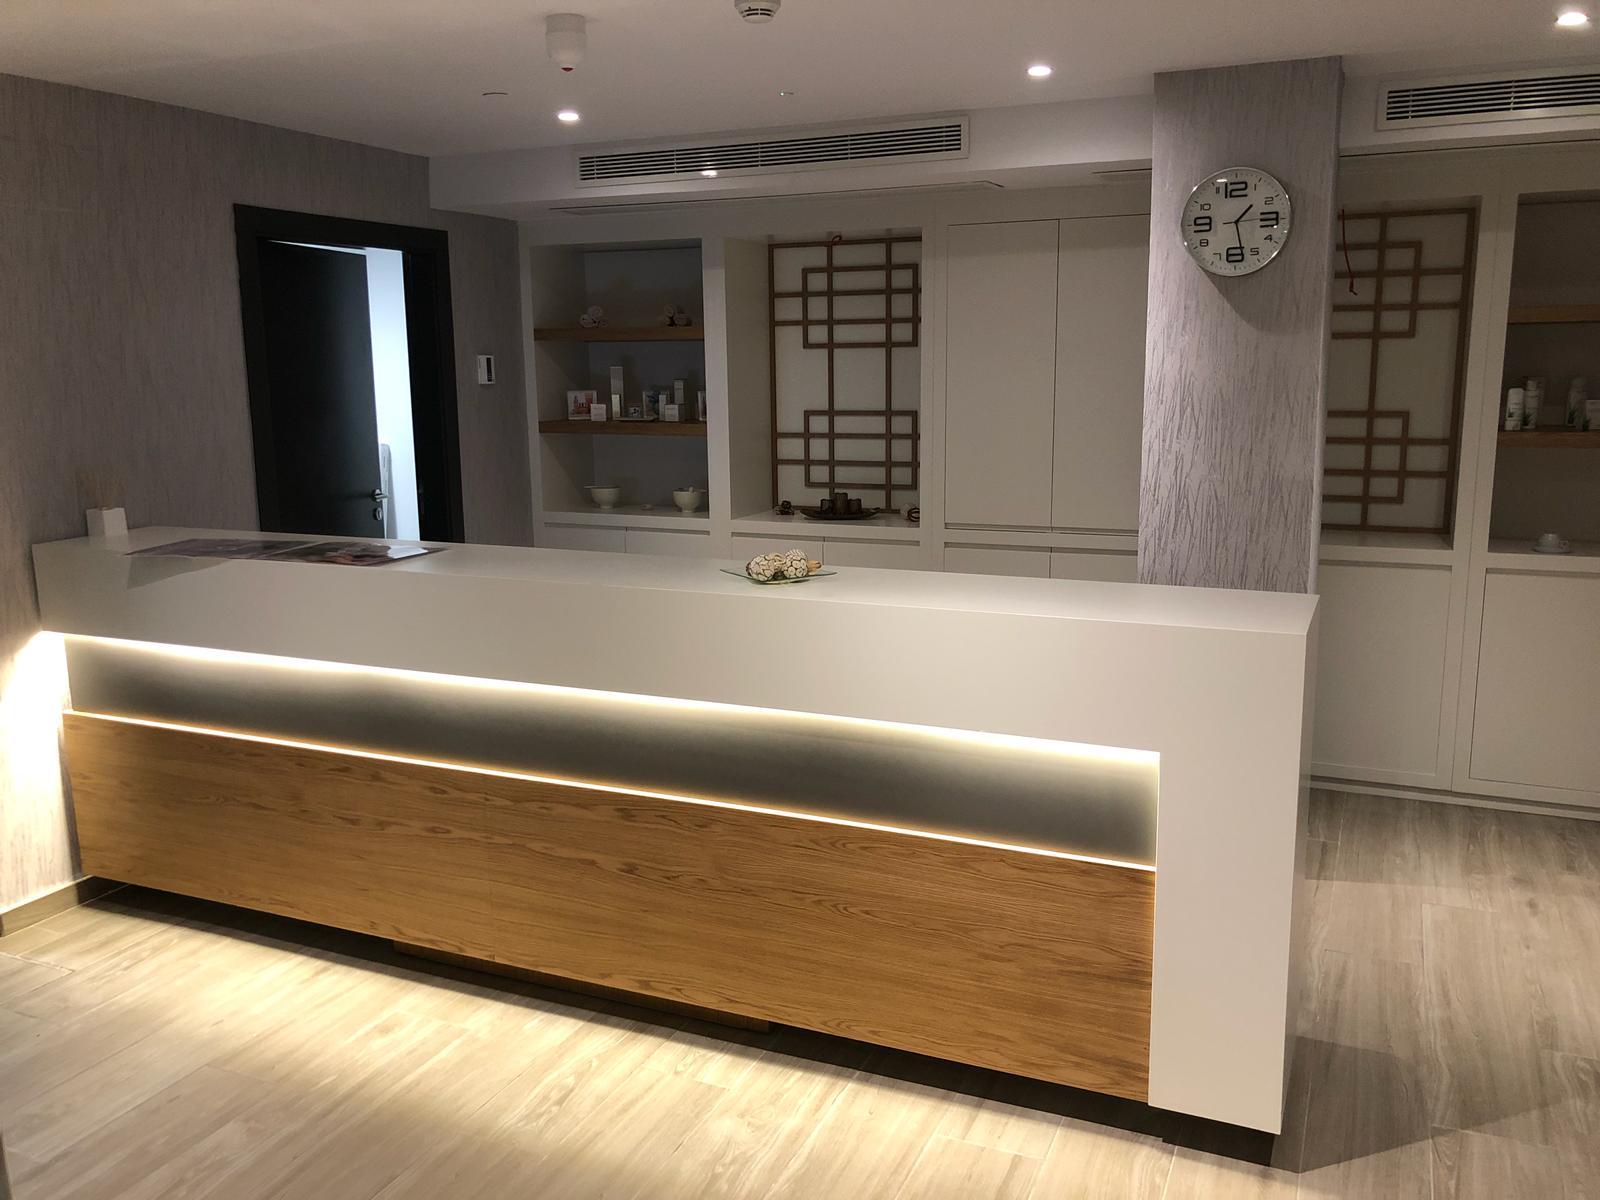 Opincan - HOTEL SBH MAXORATA RESORT - Zona SPA 2